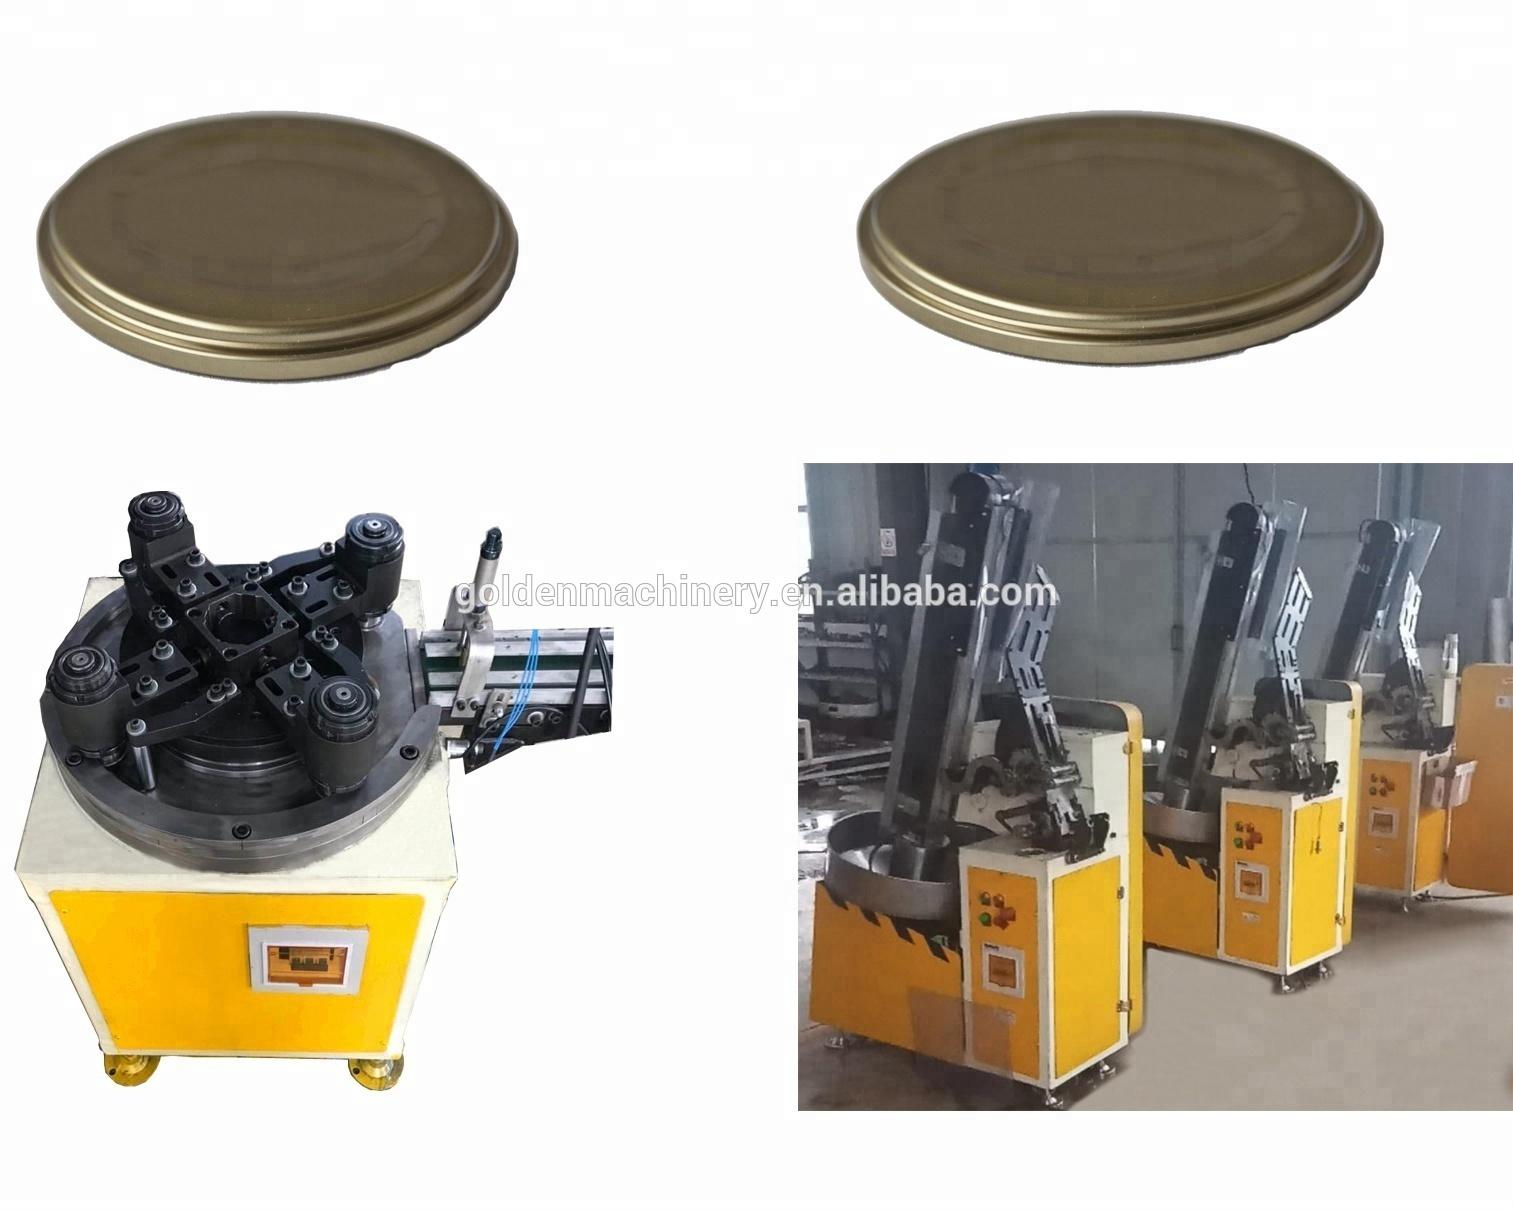 Automatic CNC Tinplate Sheet Feeding Metal Puncher dies/Punch Press for twist off CKO SKO cap making machine line